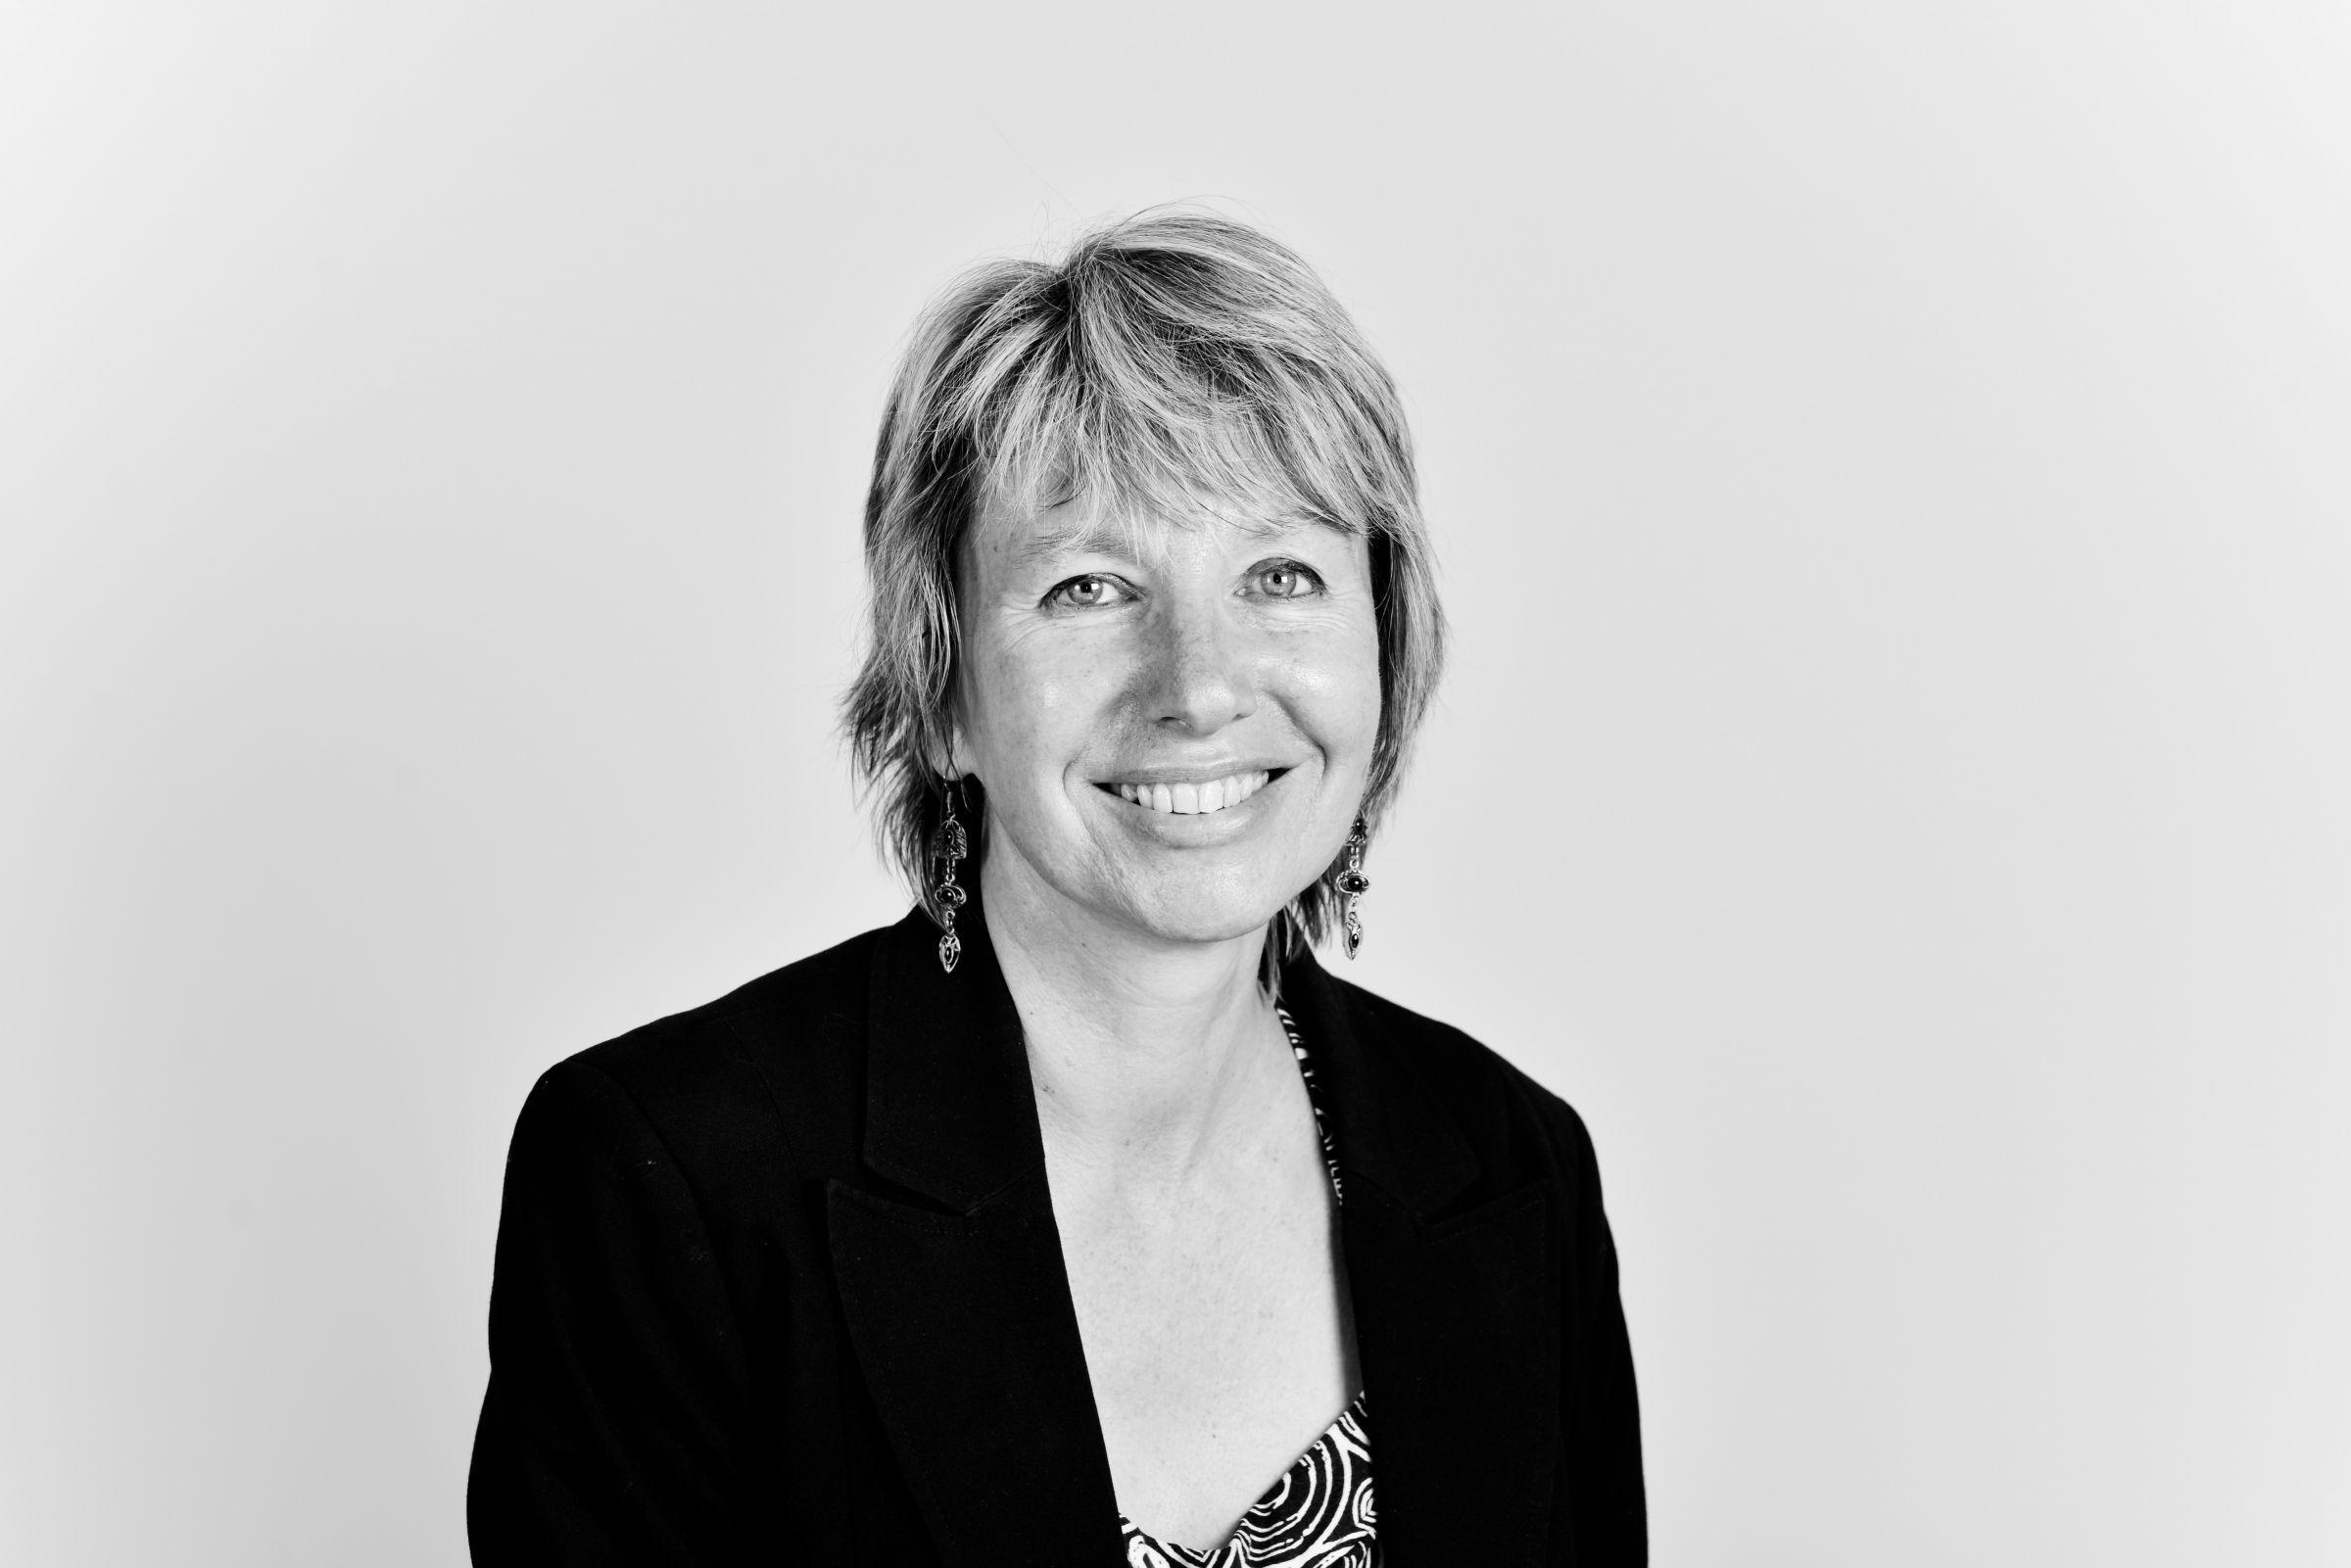 Jacqueline Millward, Head of Place